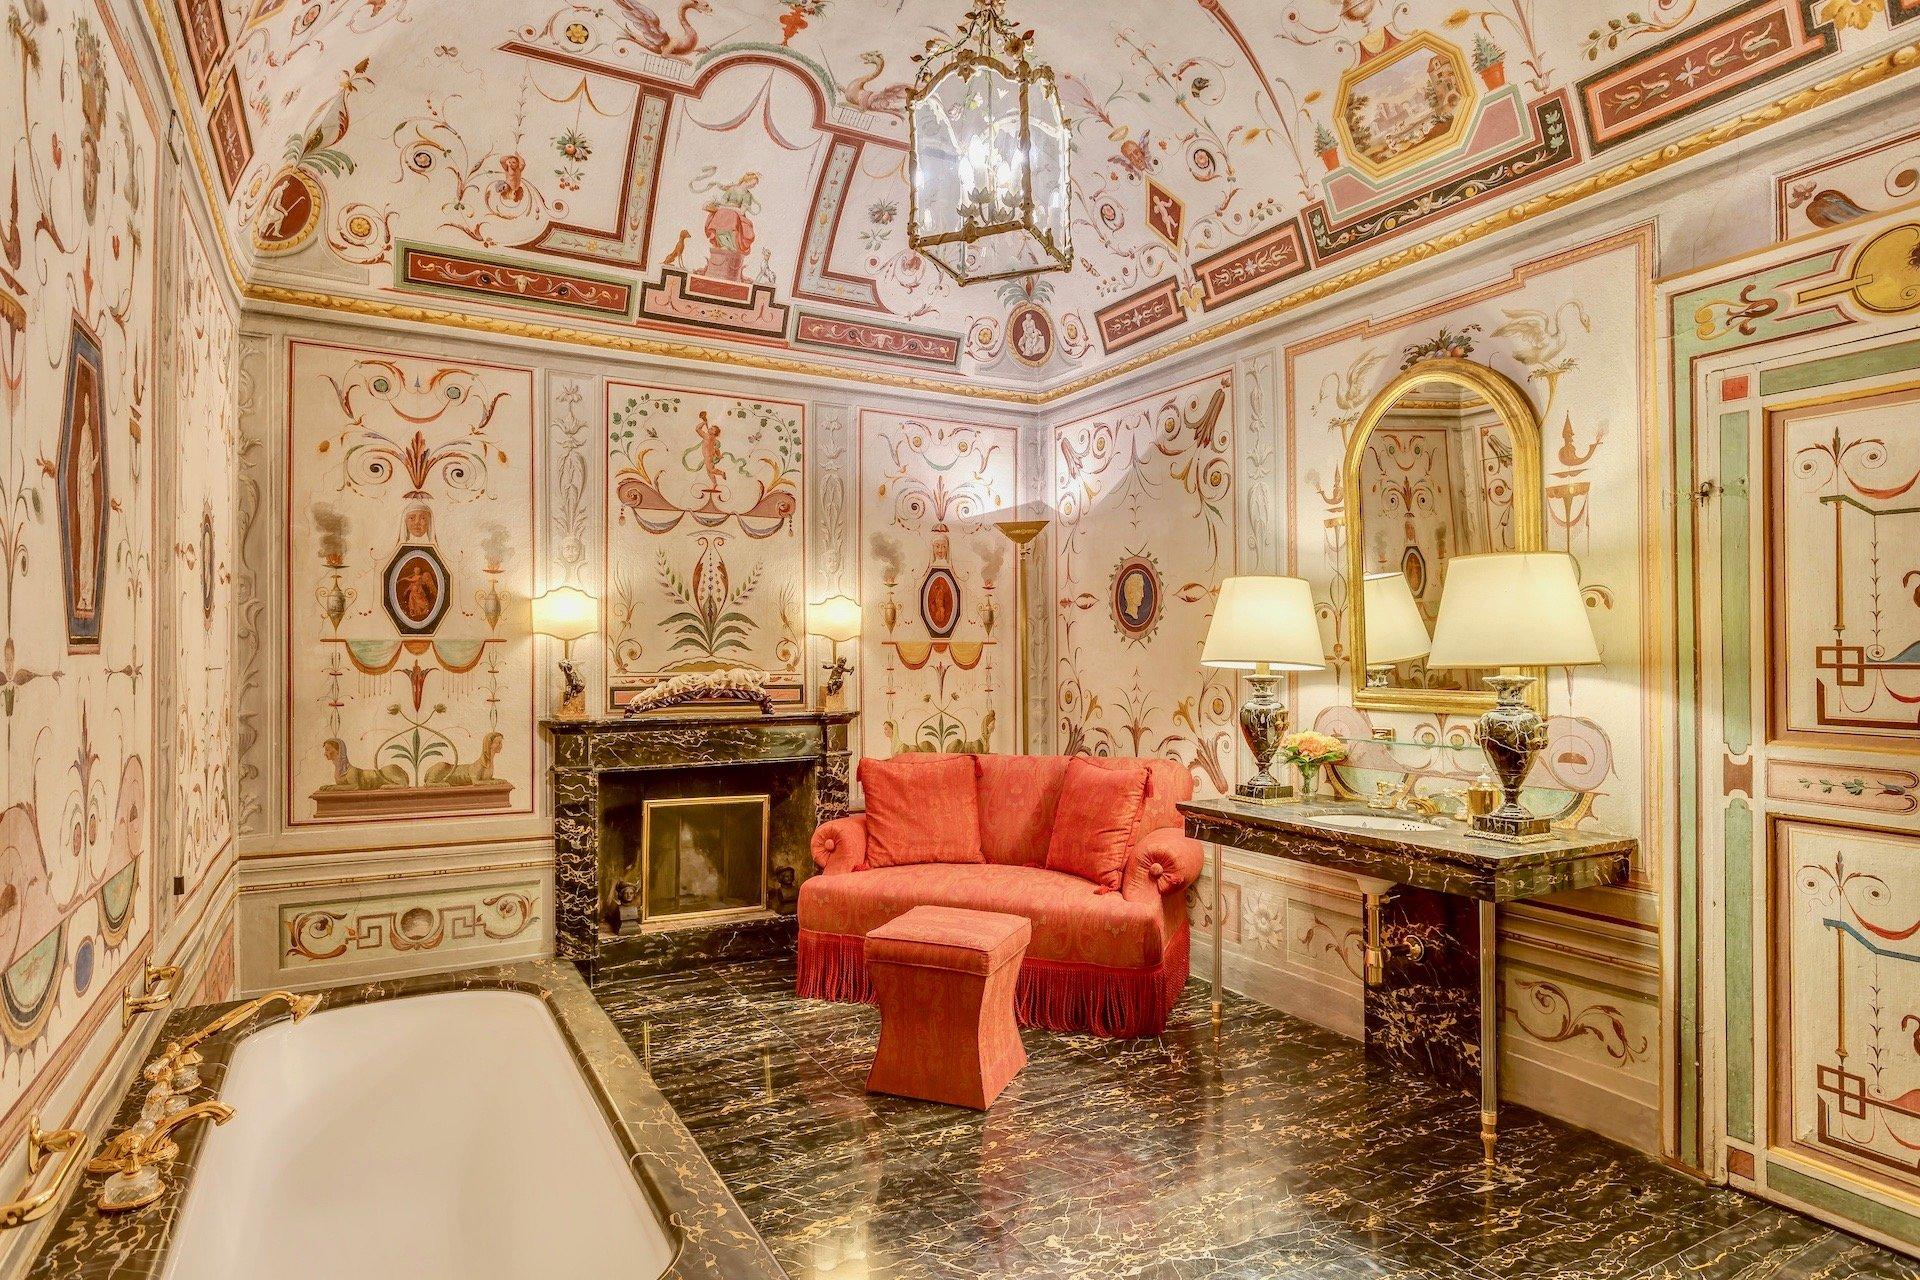 9.The Baldacchino Bathroom